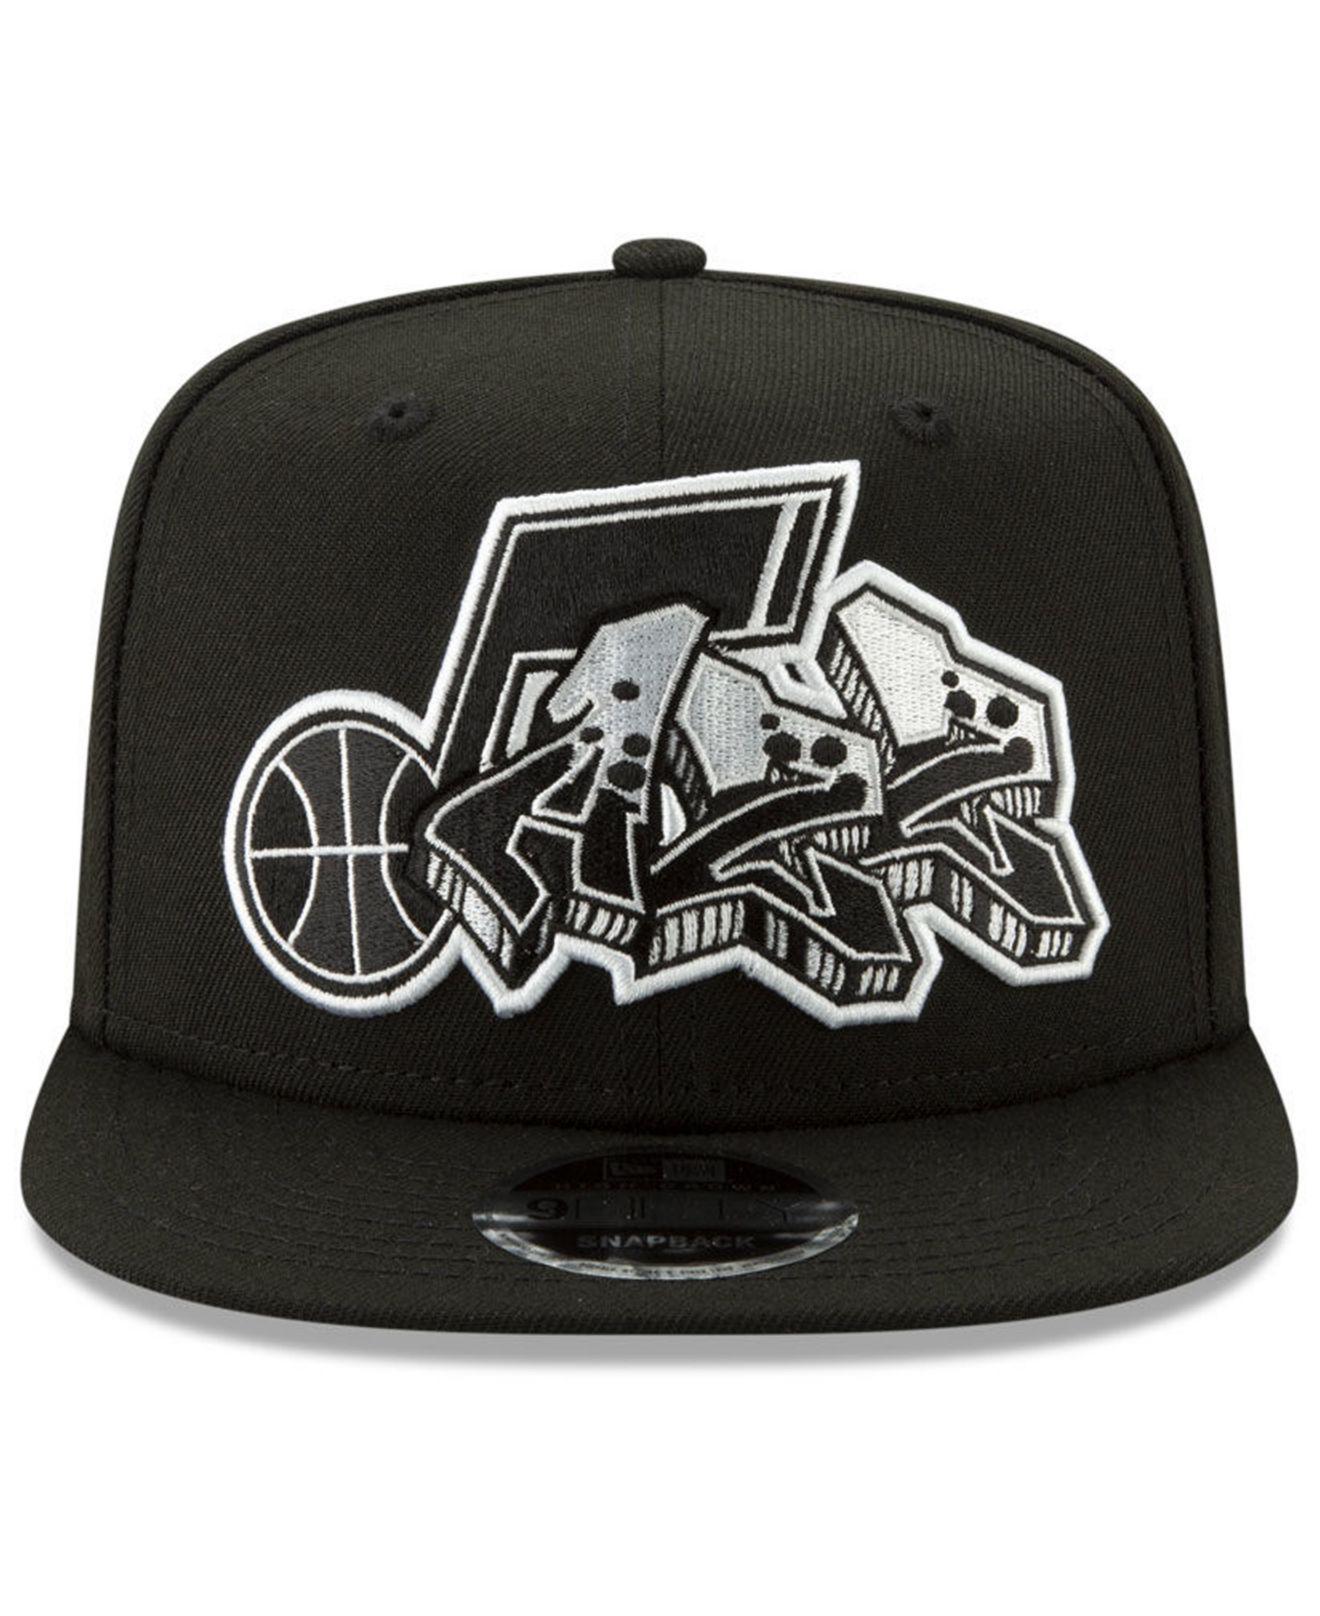 lowest price bf0d8 0099b KTZ Chicago Bulls Retroword Black White 9fifty Snapback Cap in Black ...